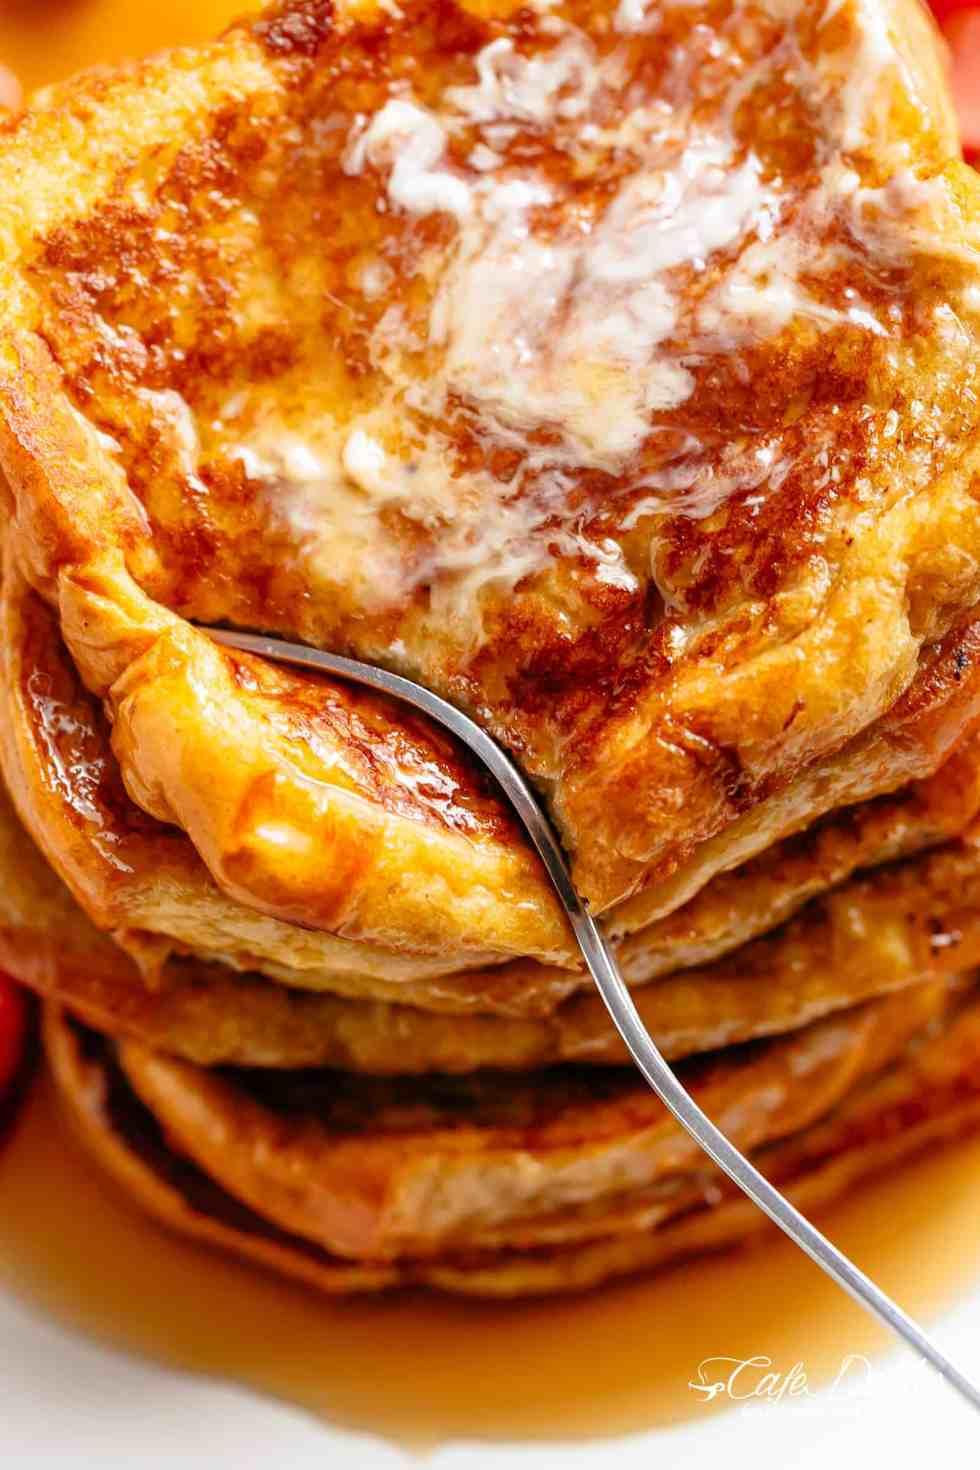 Best French Toast | cafedelites.com